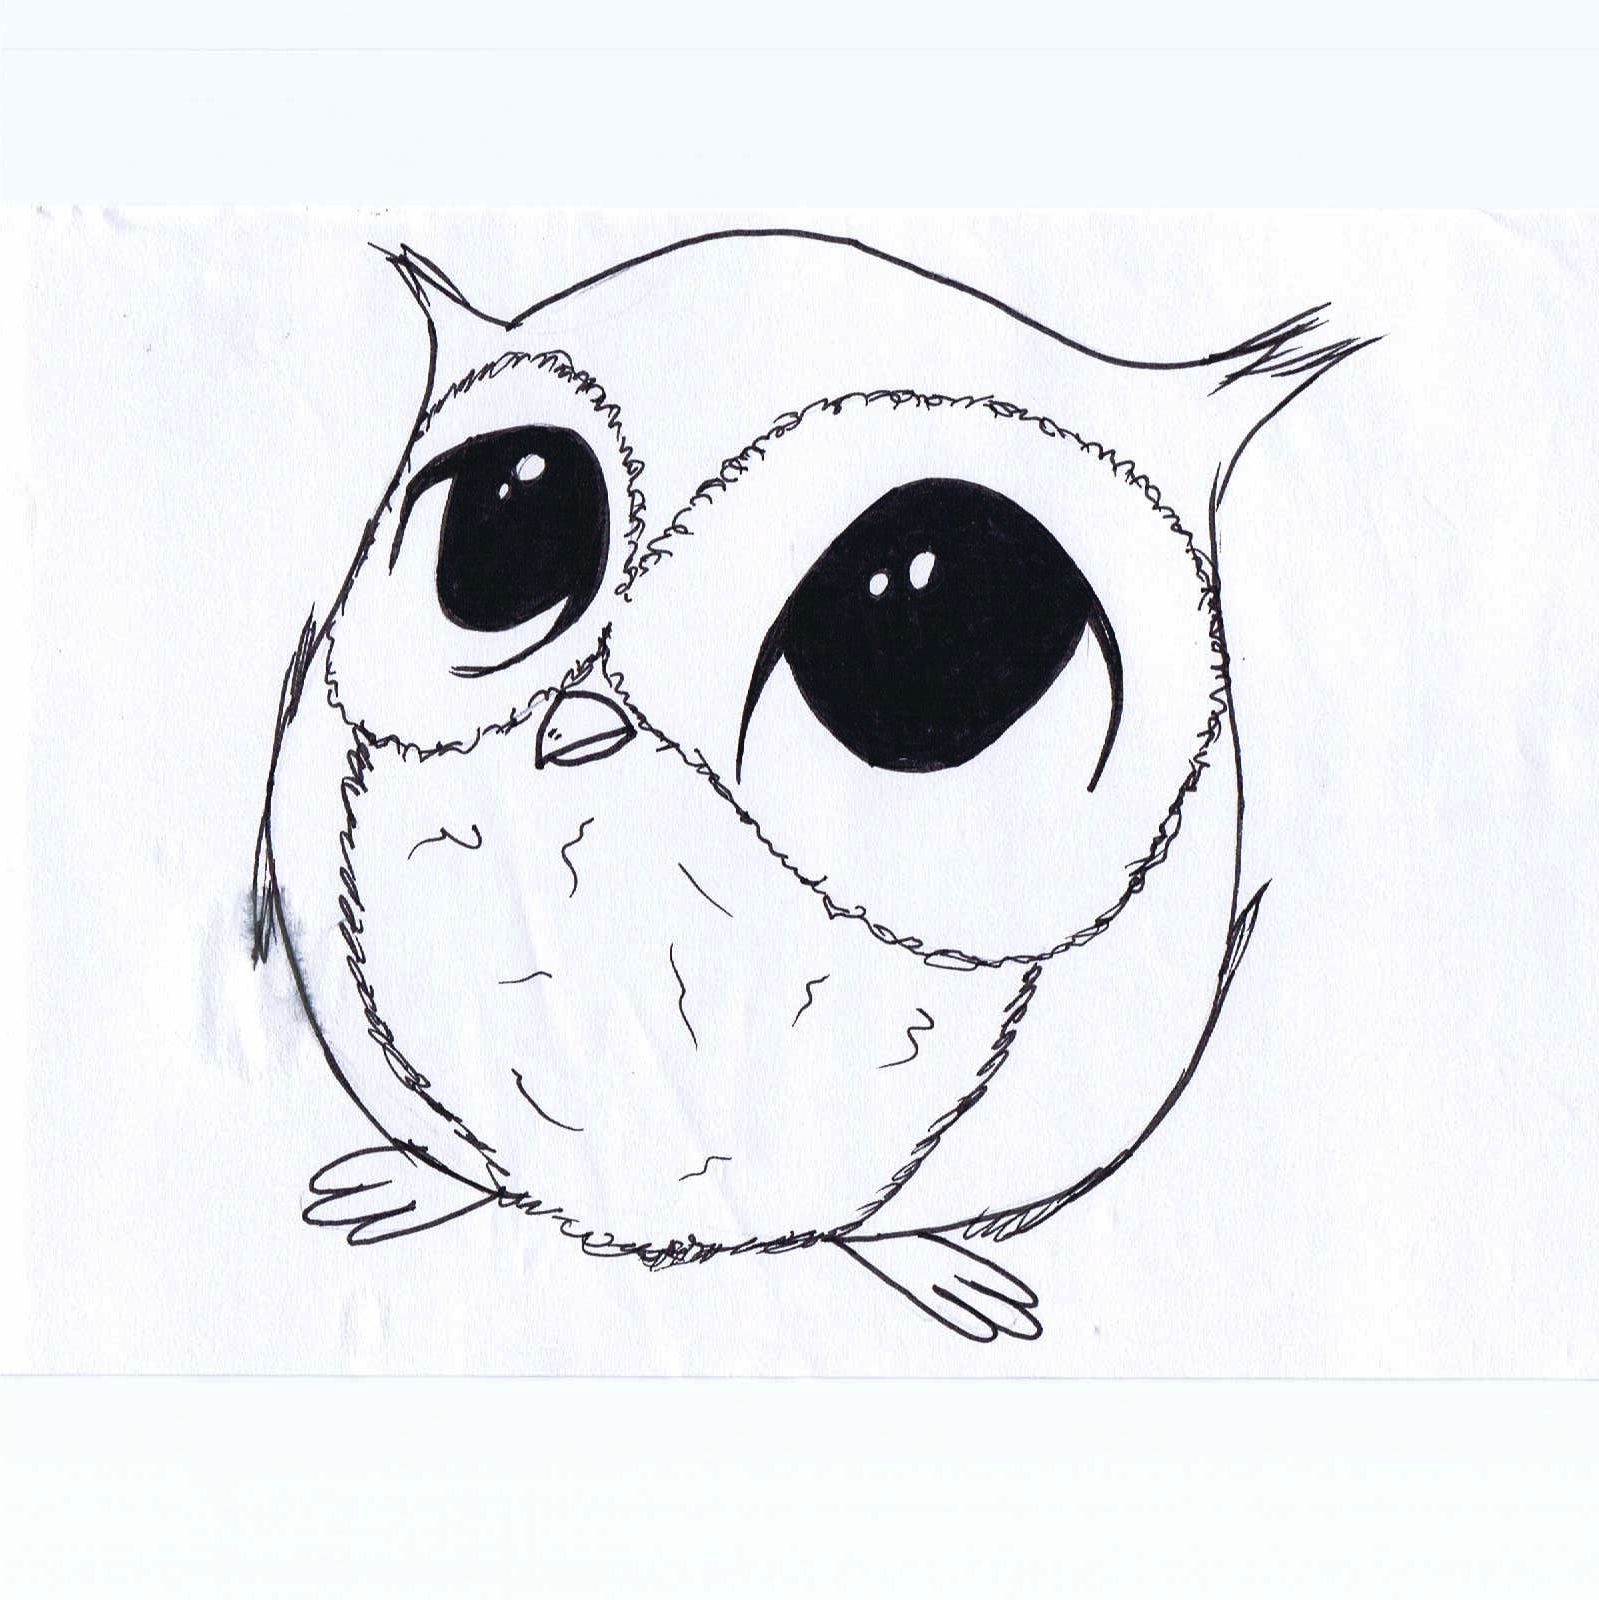 drawings of cute animals in pencil easy easy pencil drawings of cute